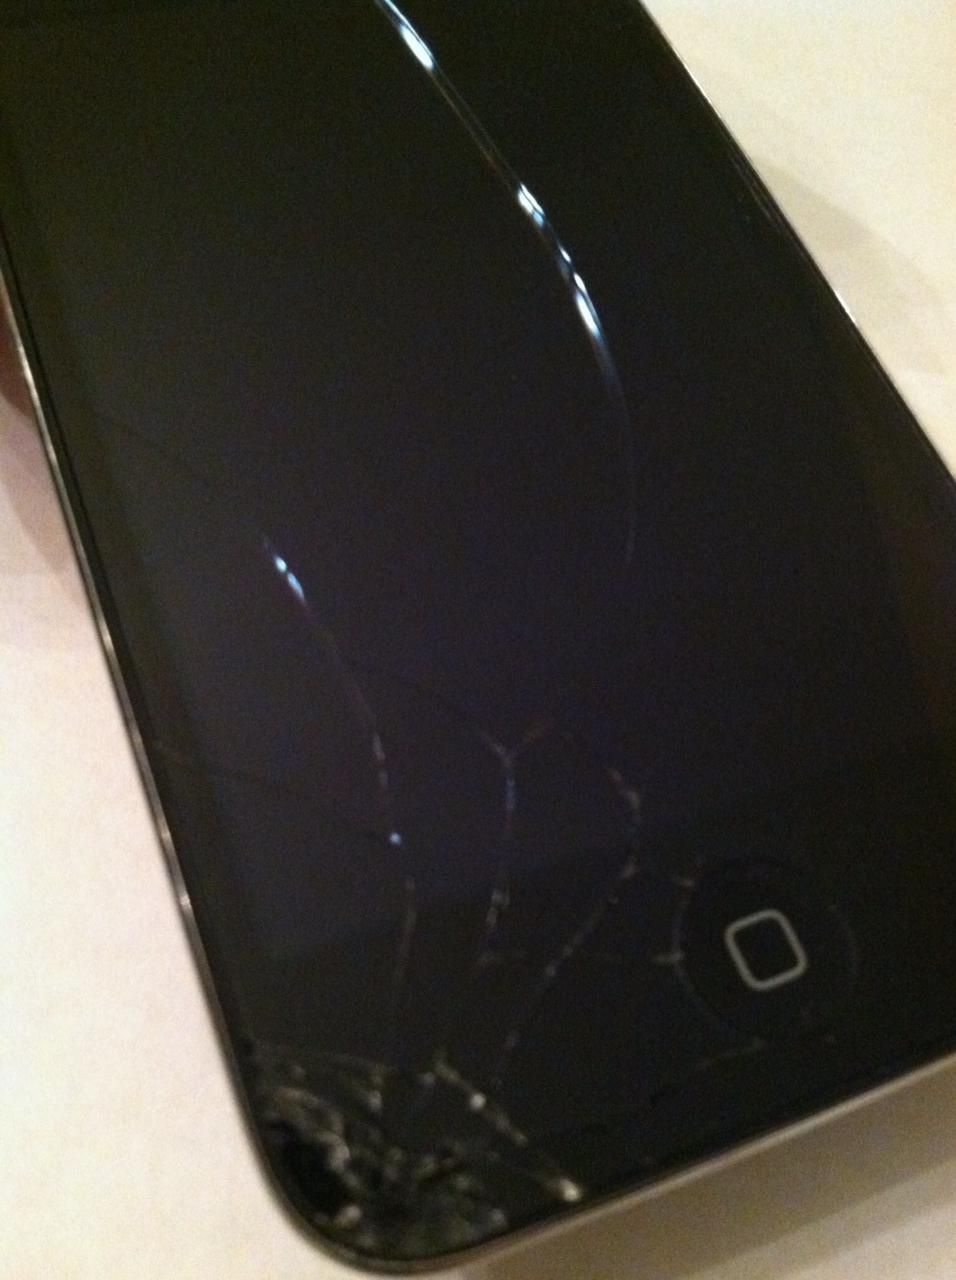 cracked-ipod1.jpeg